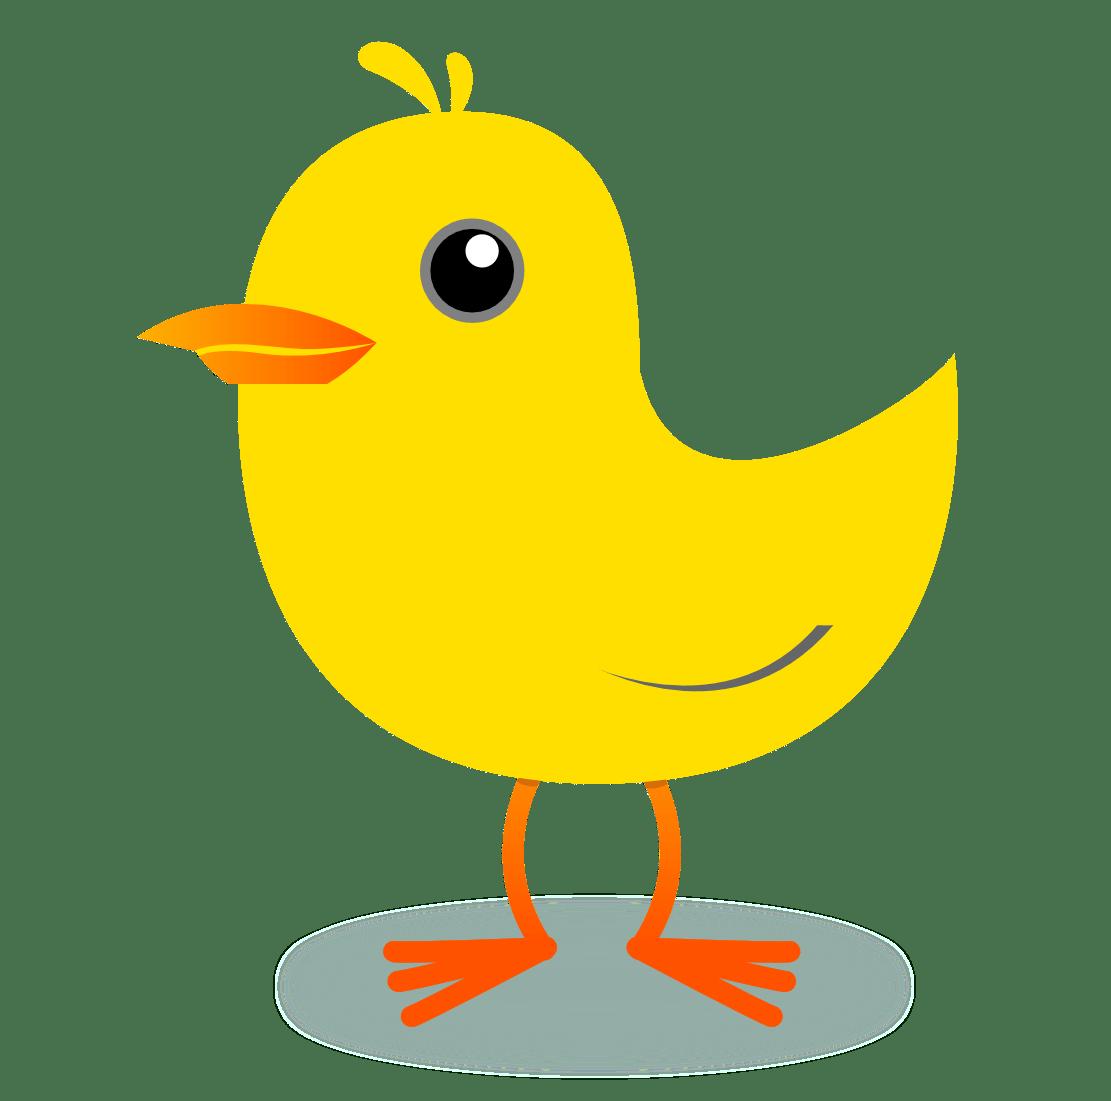 hight resolution of yellow bird clipart